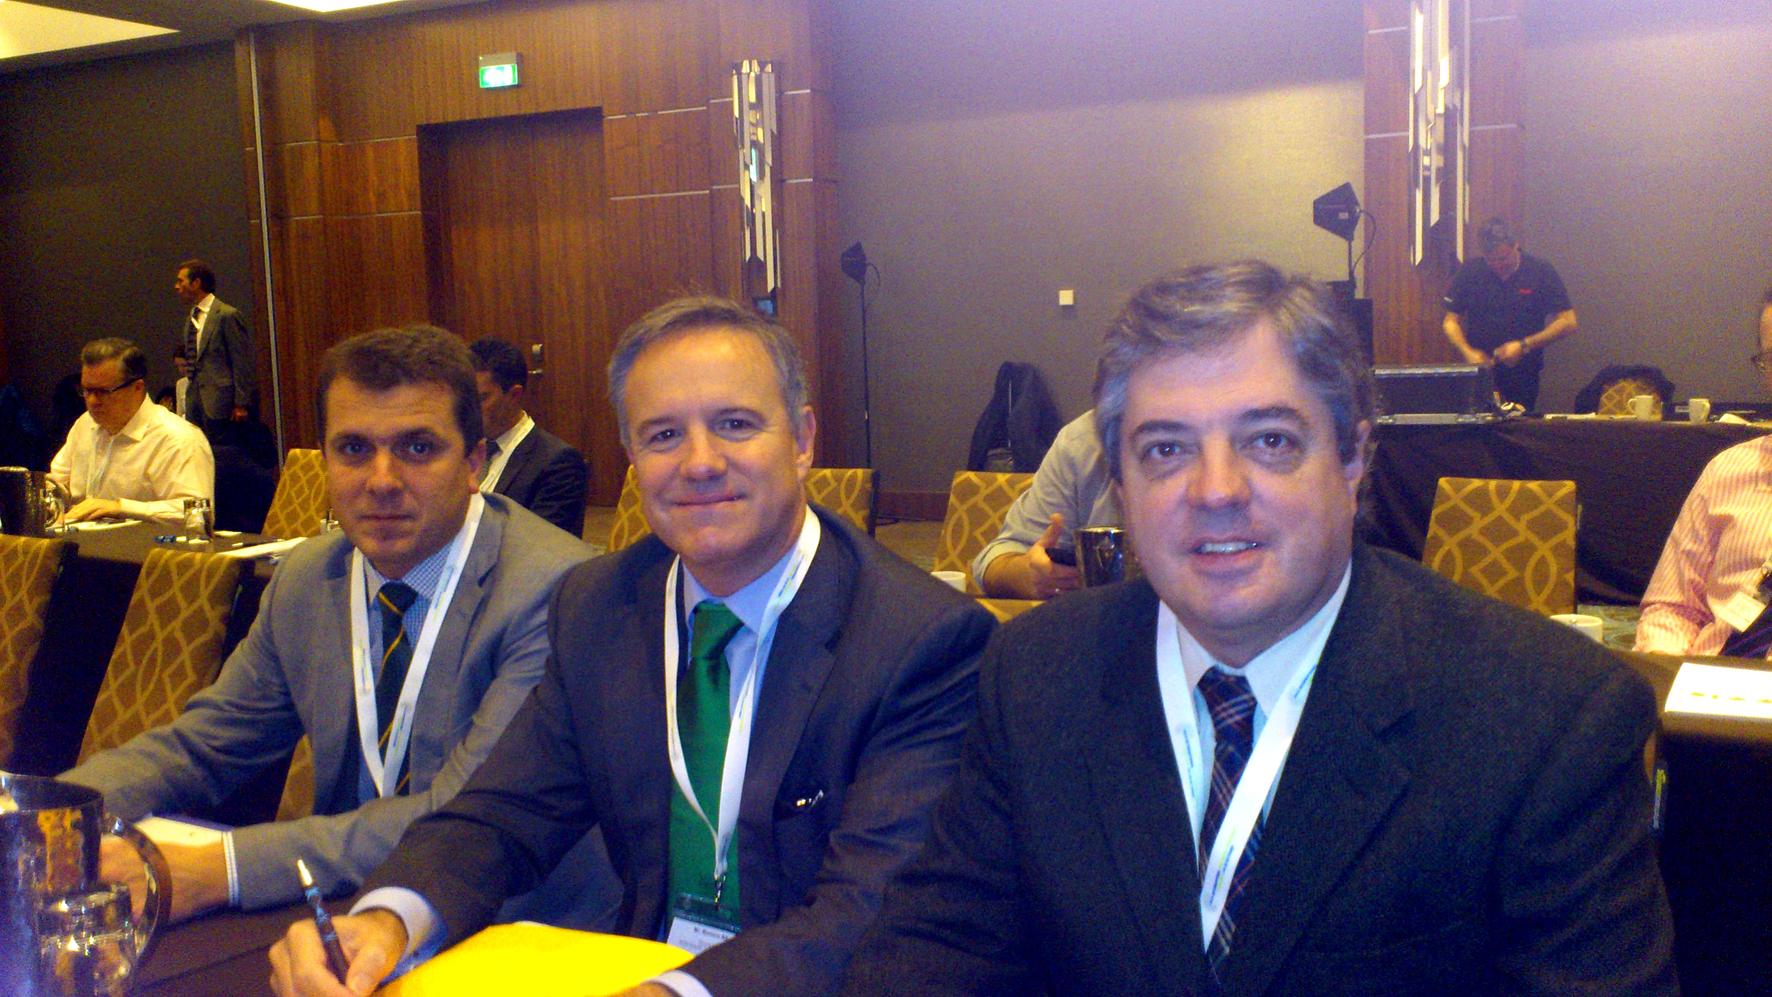 Productores e importadores de maderas con feras conf an en un ligero repunte en 2014 - Maderas alberch ...